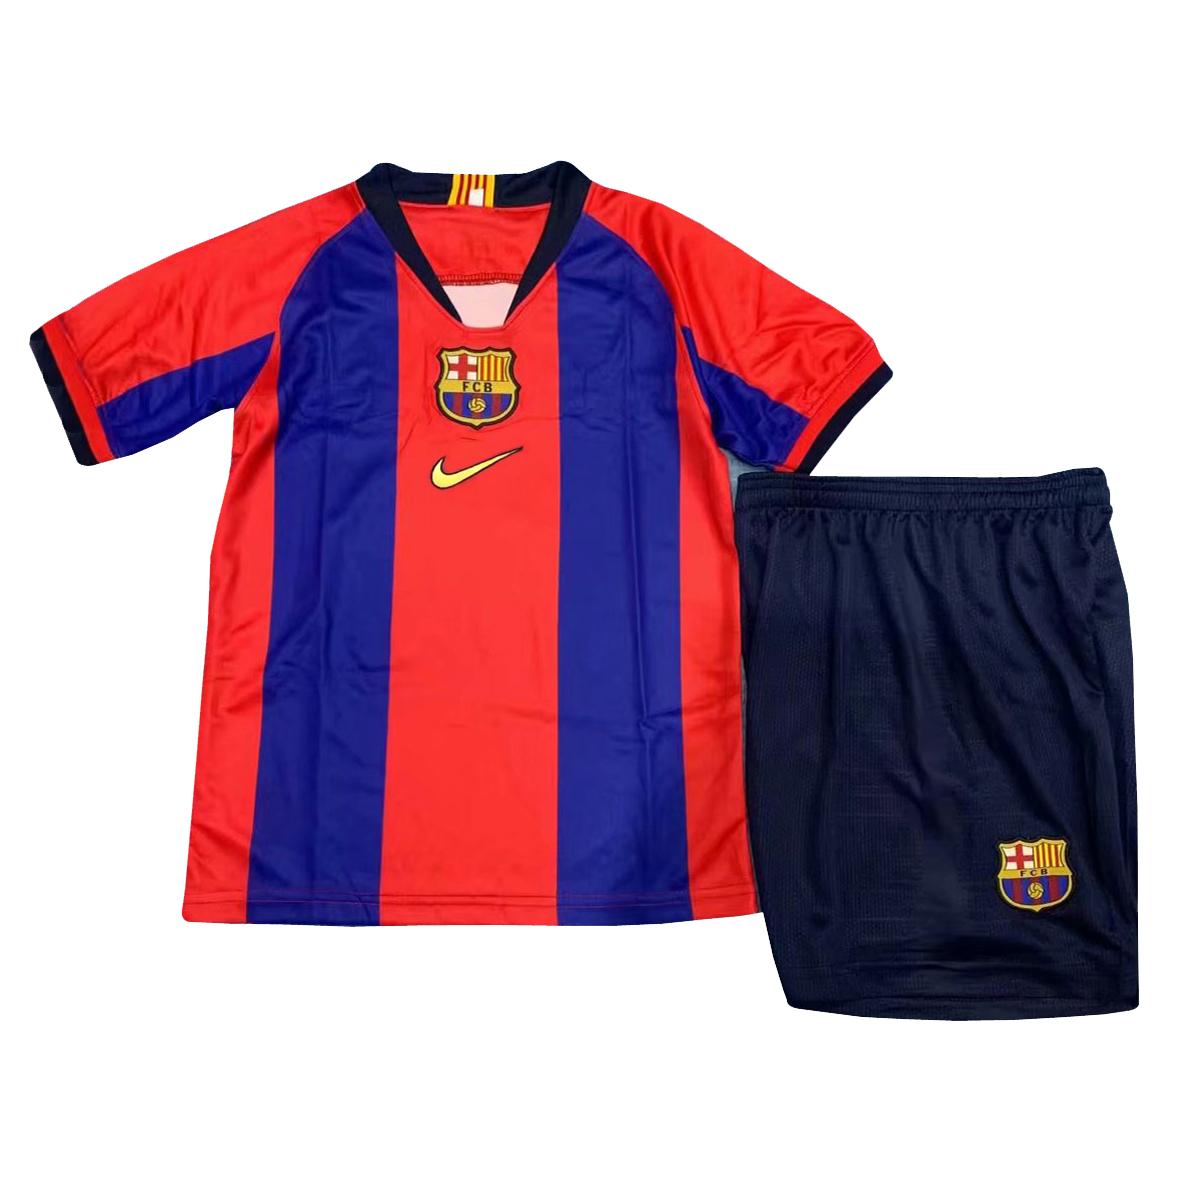 edb32988cb8 US$ 14.8 - Nike El Clasico Barcelona Home Jersey Kids 2019/20 -  www.fcsoccerworld.com